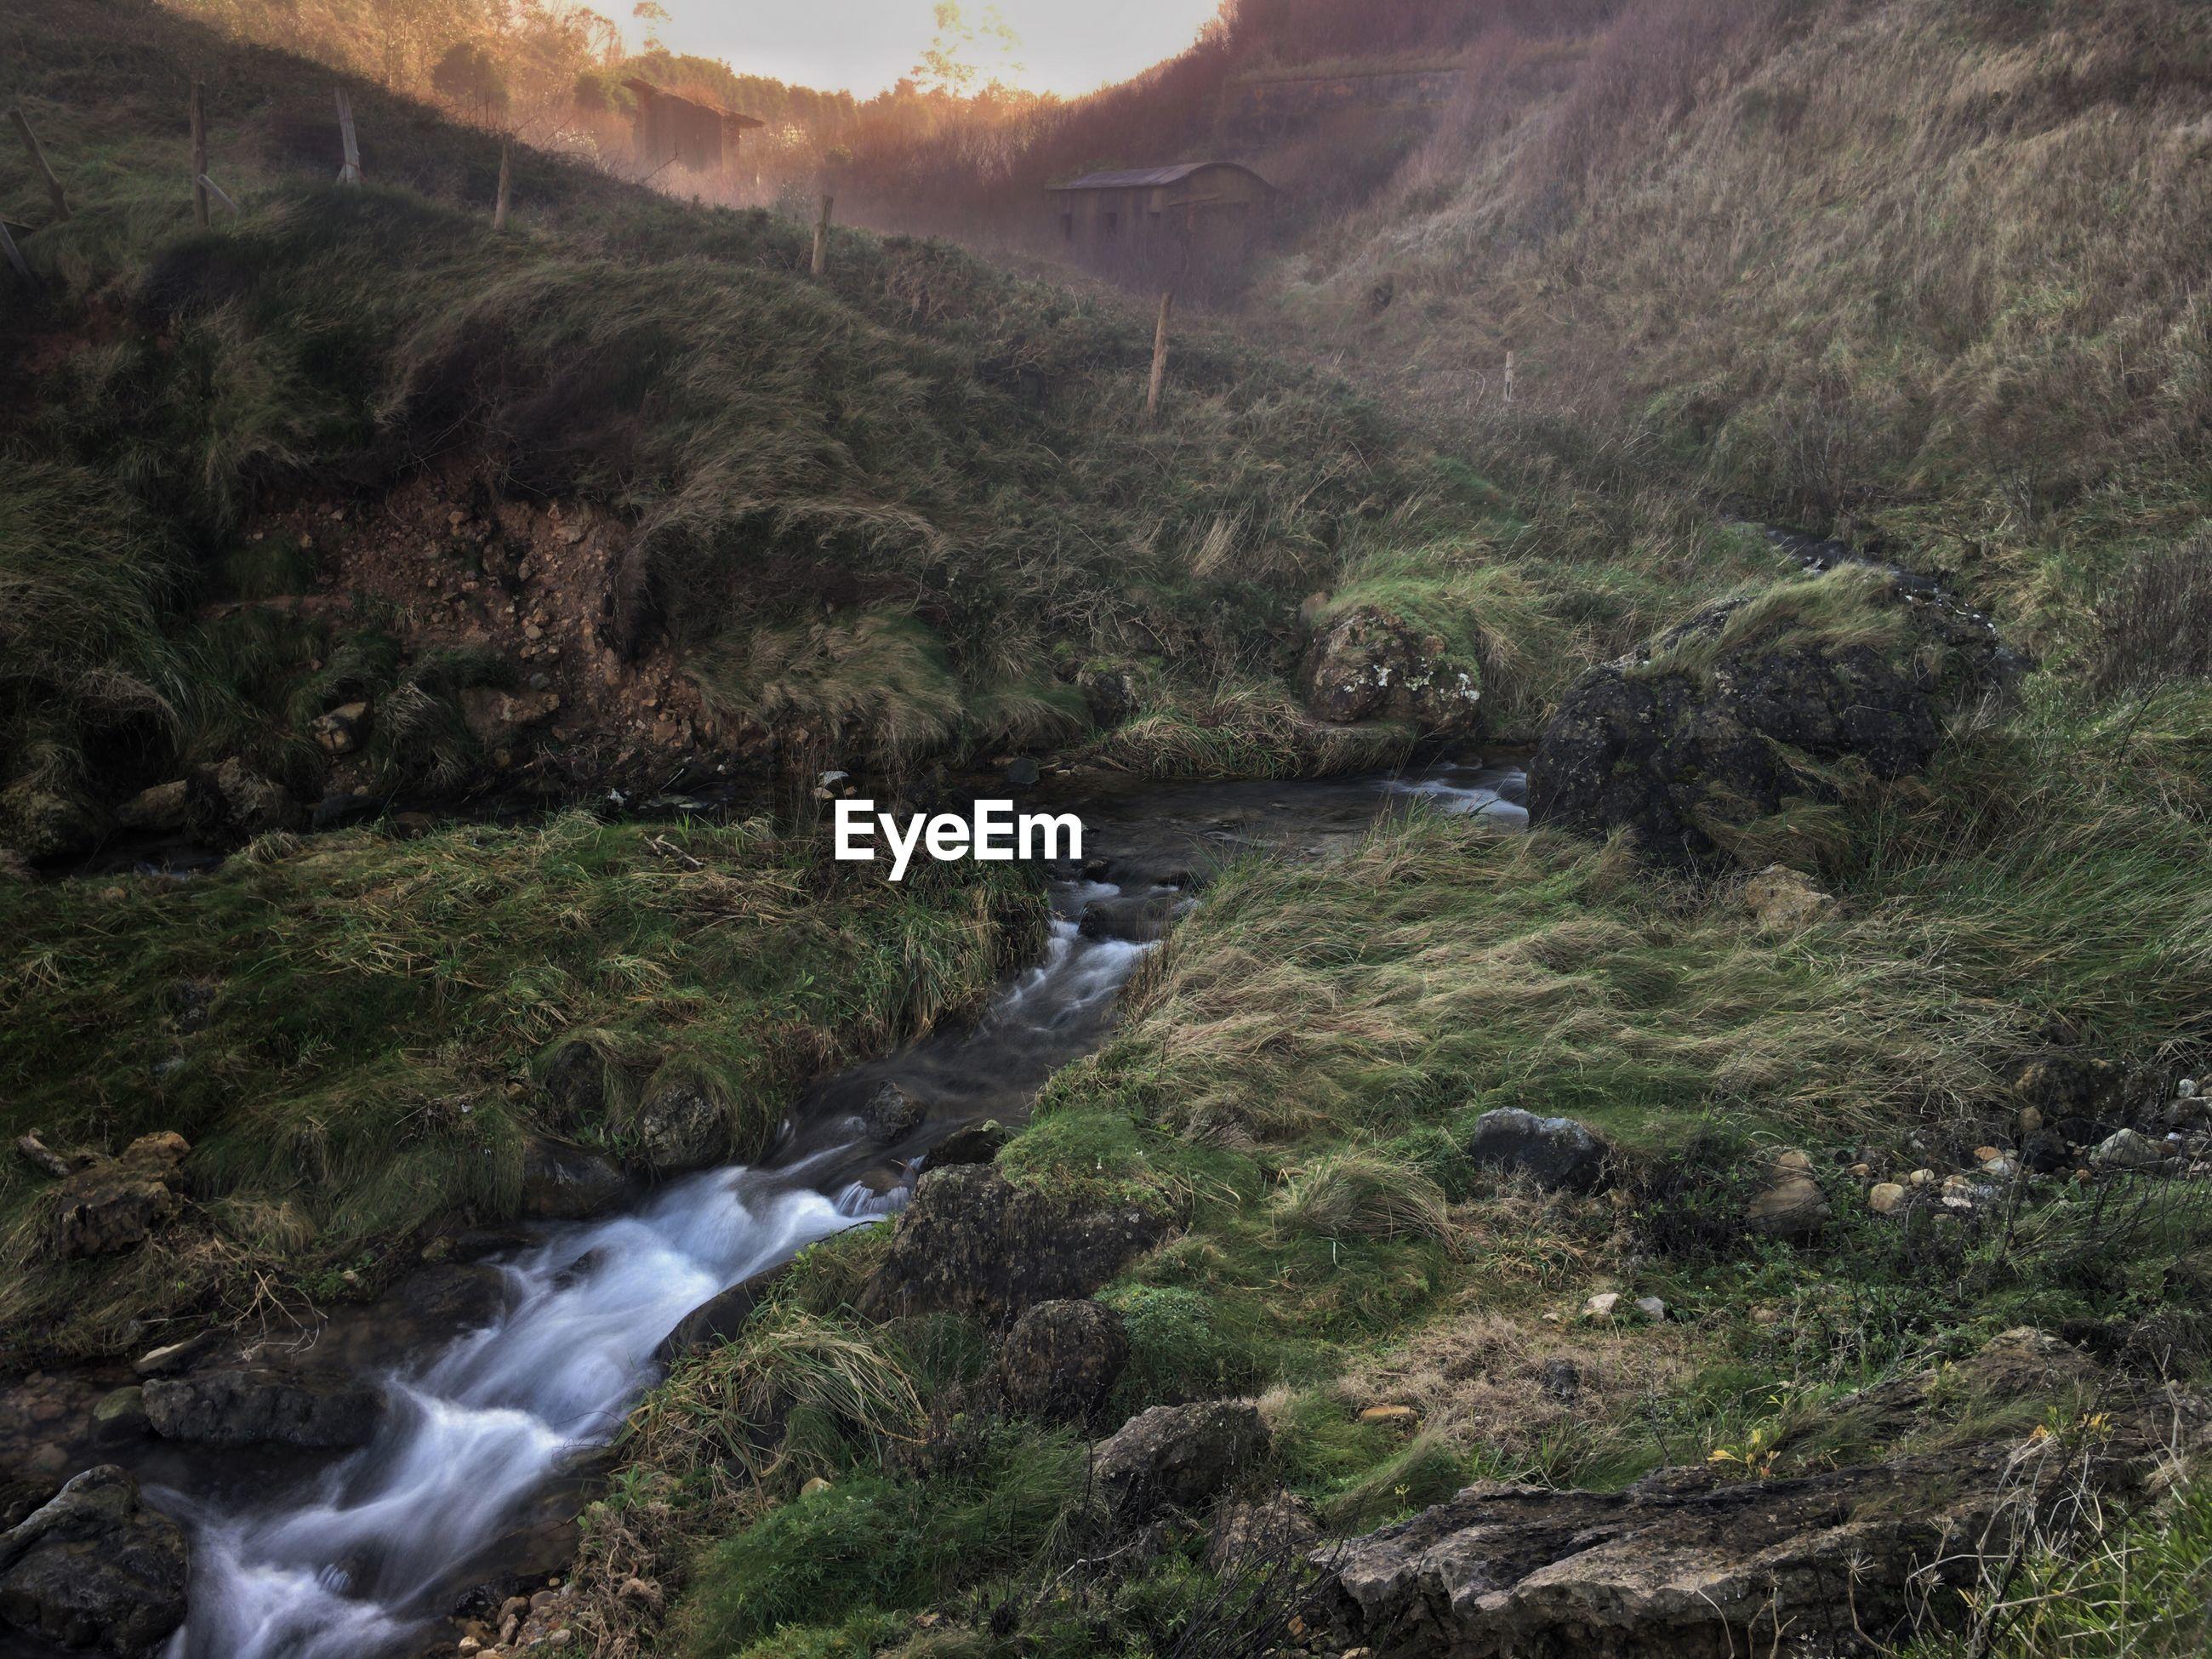 Stream flowing through rocks in river